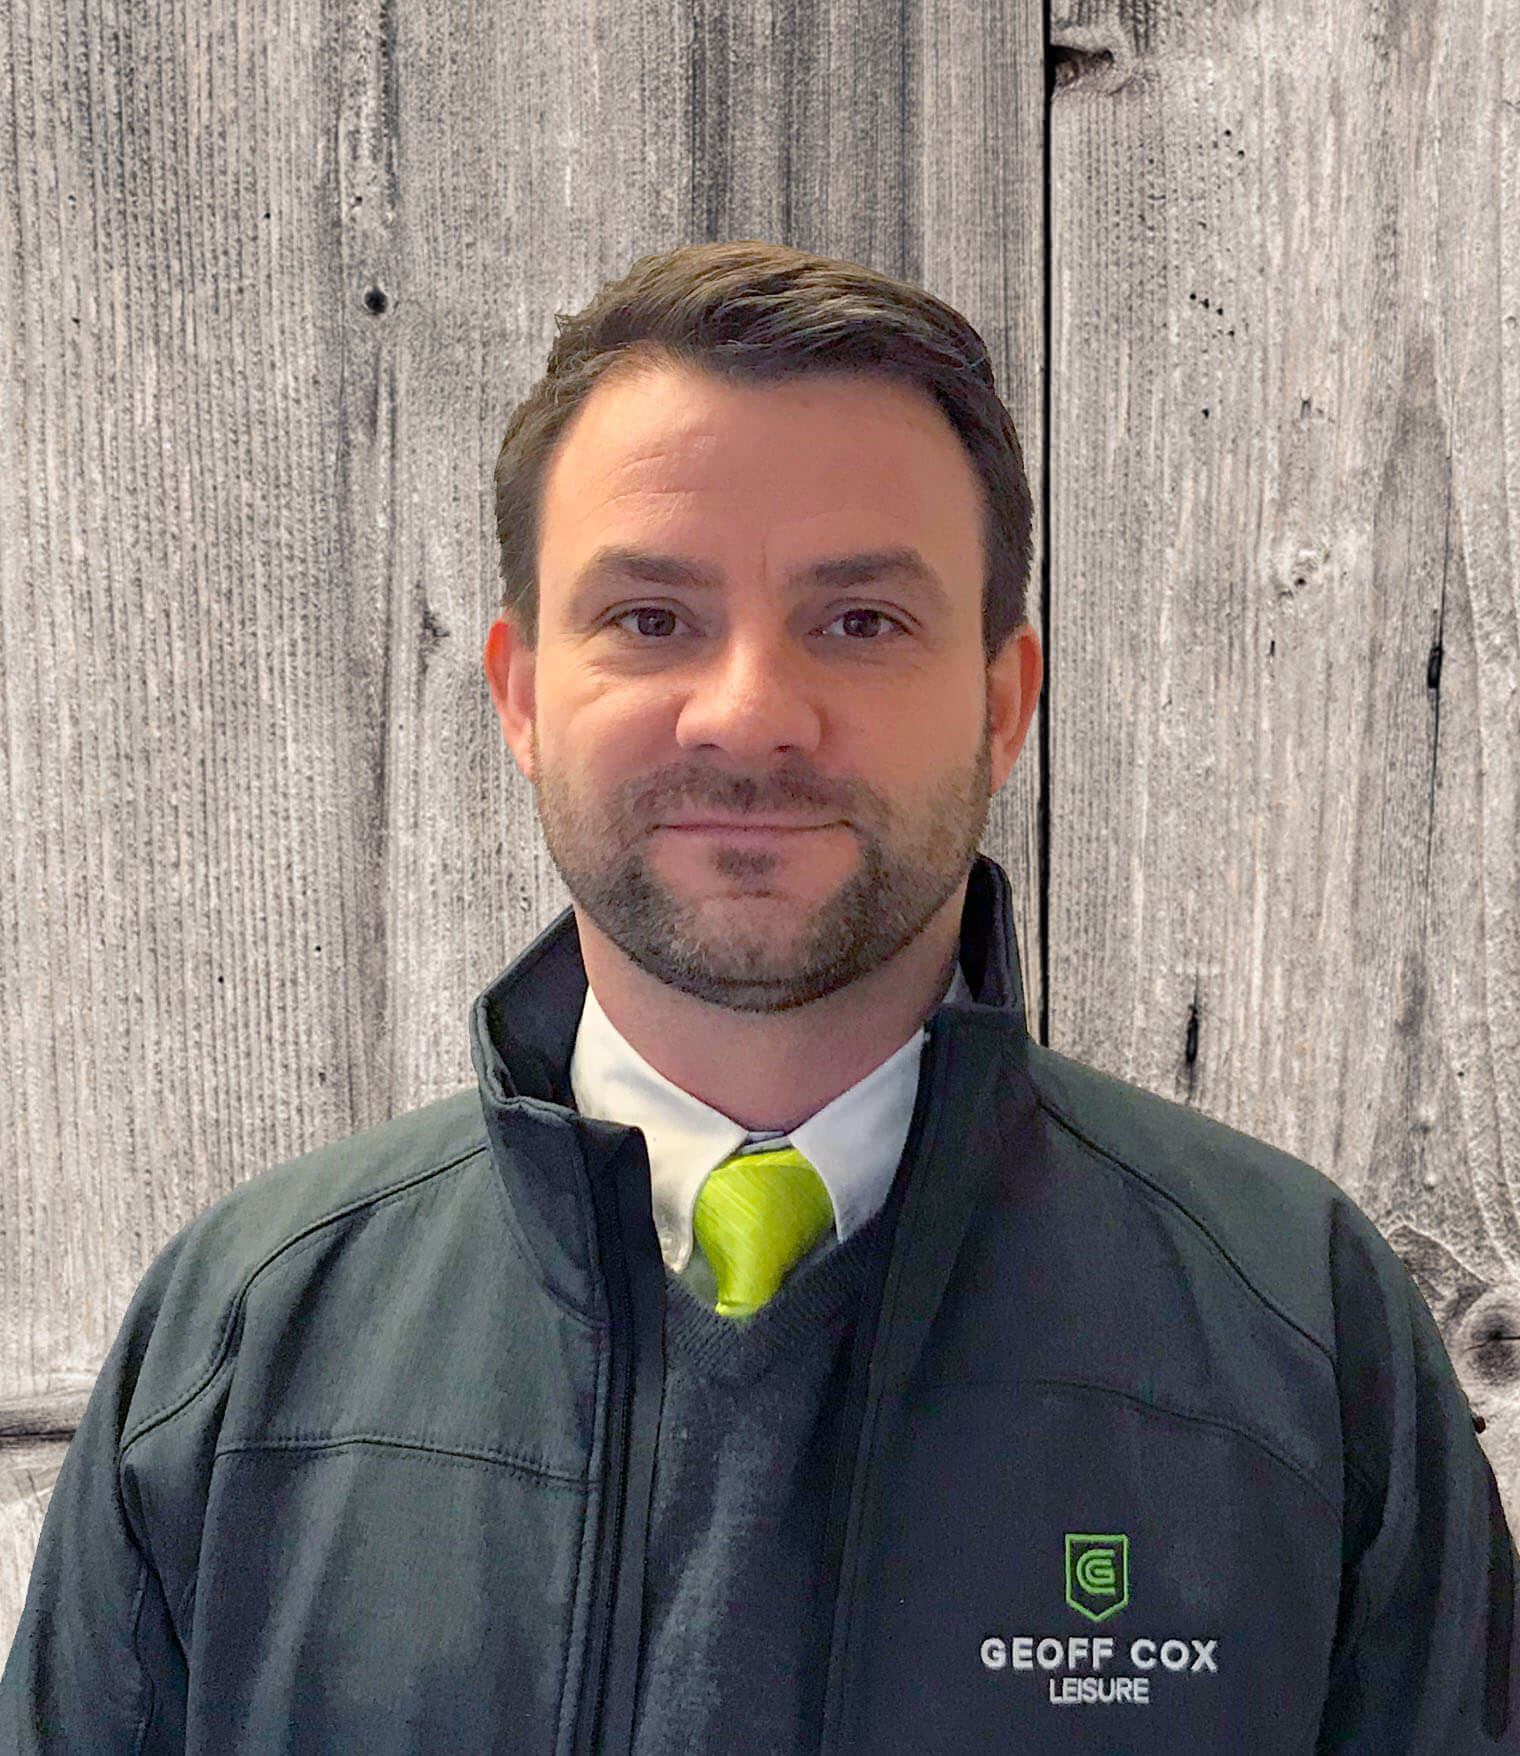 Gavin Cox Leisure Director